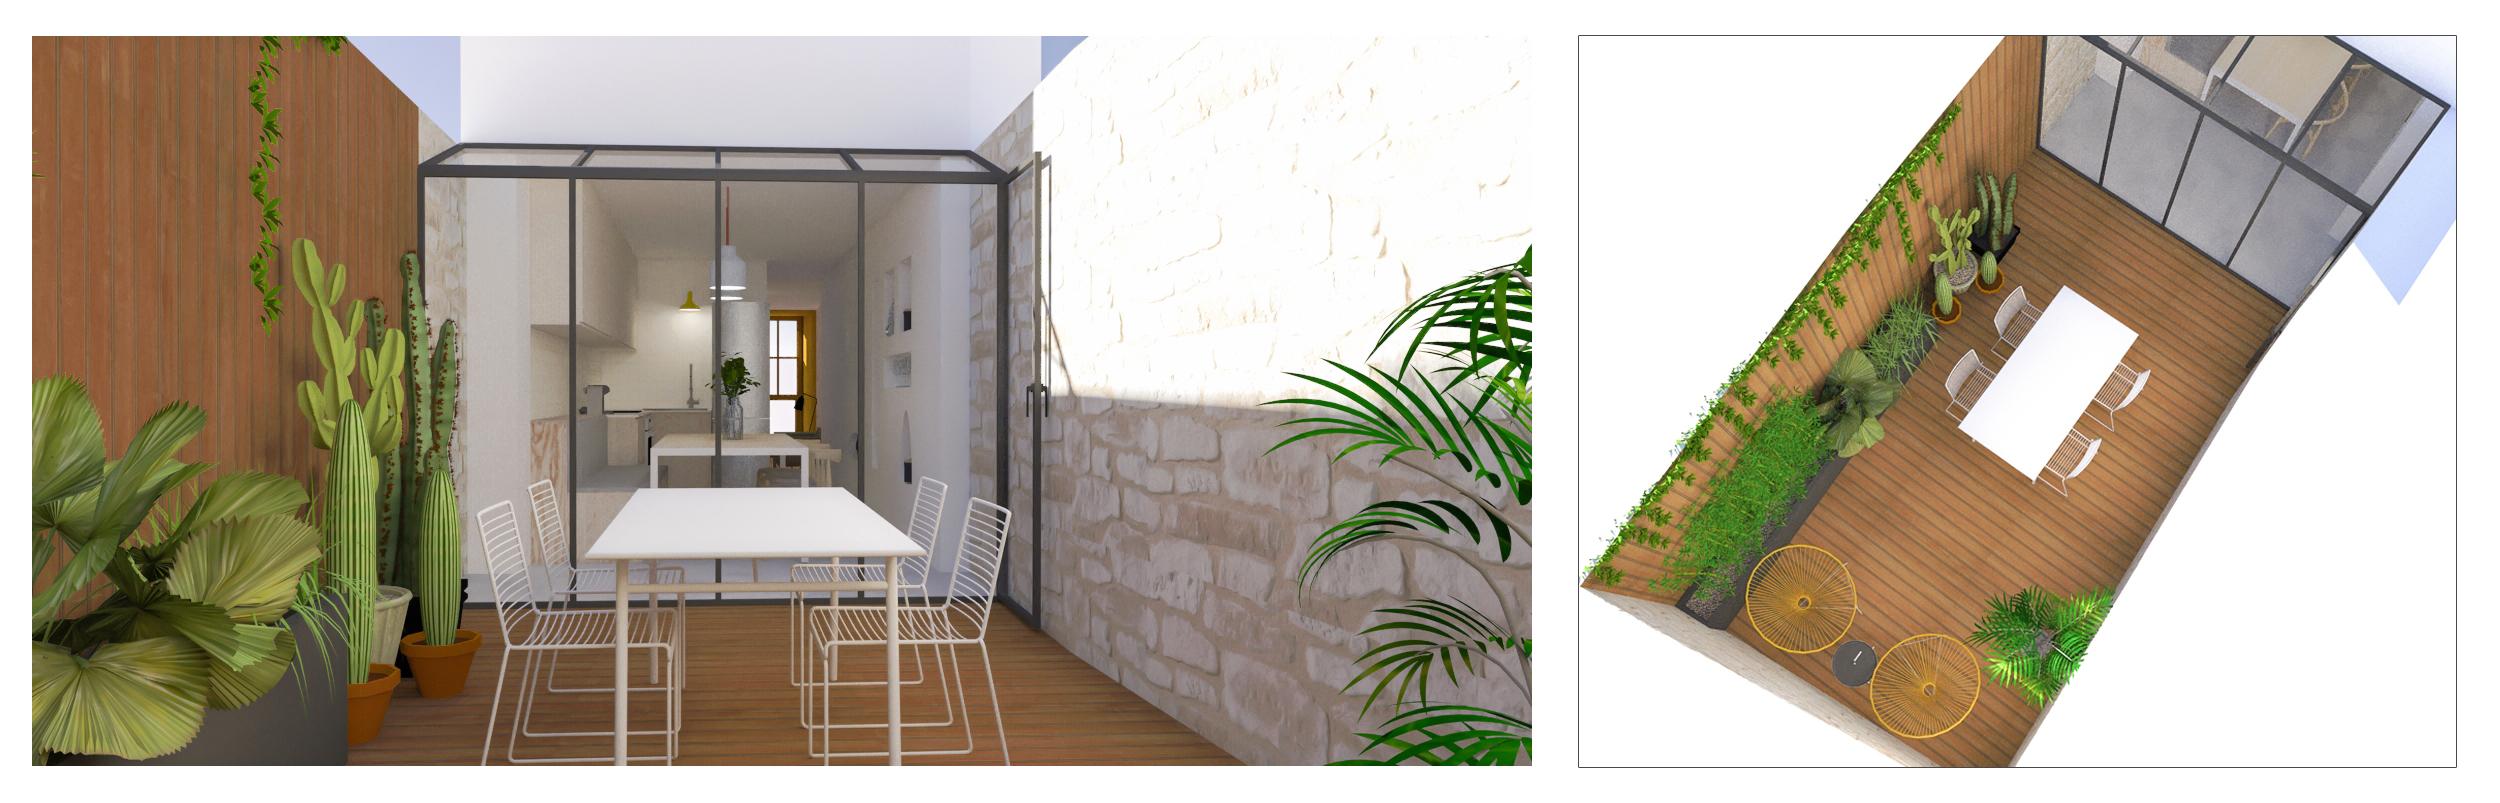 6-Andronne-terrasse copie